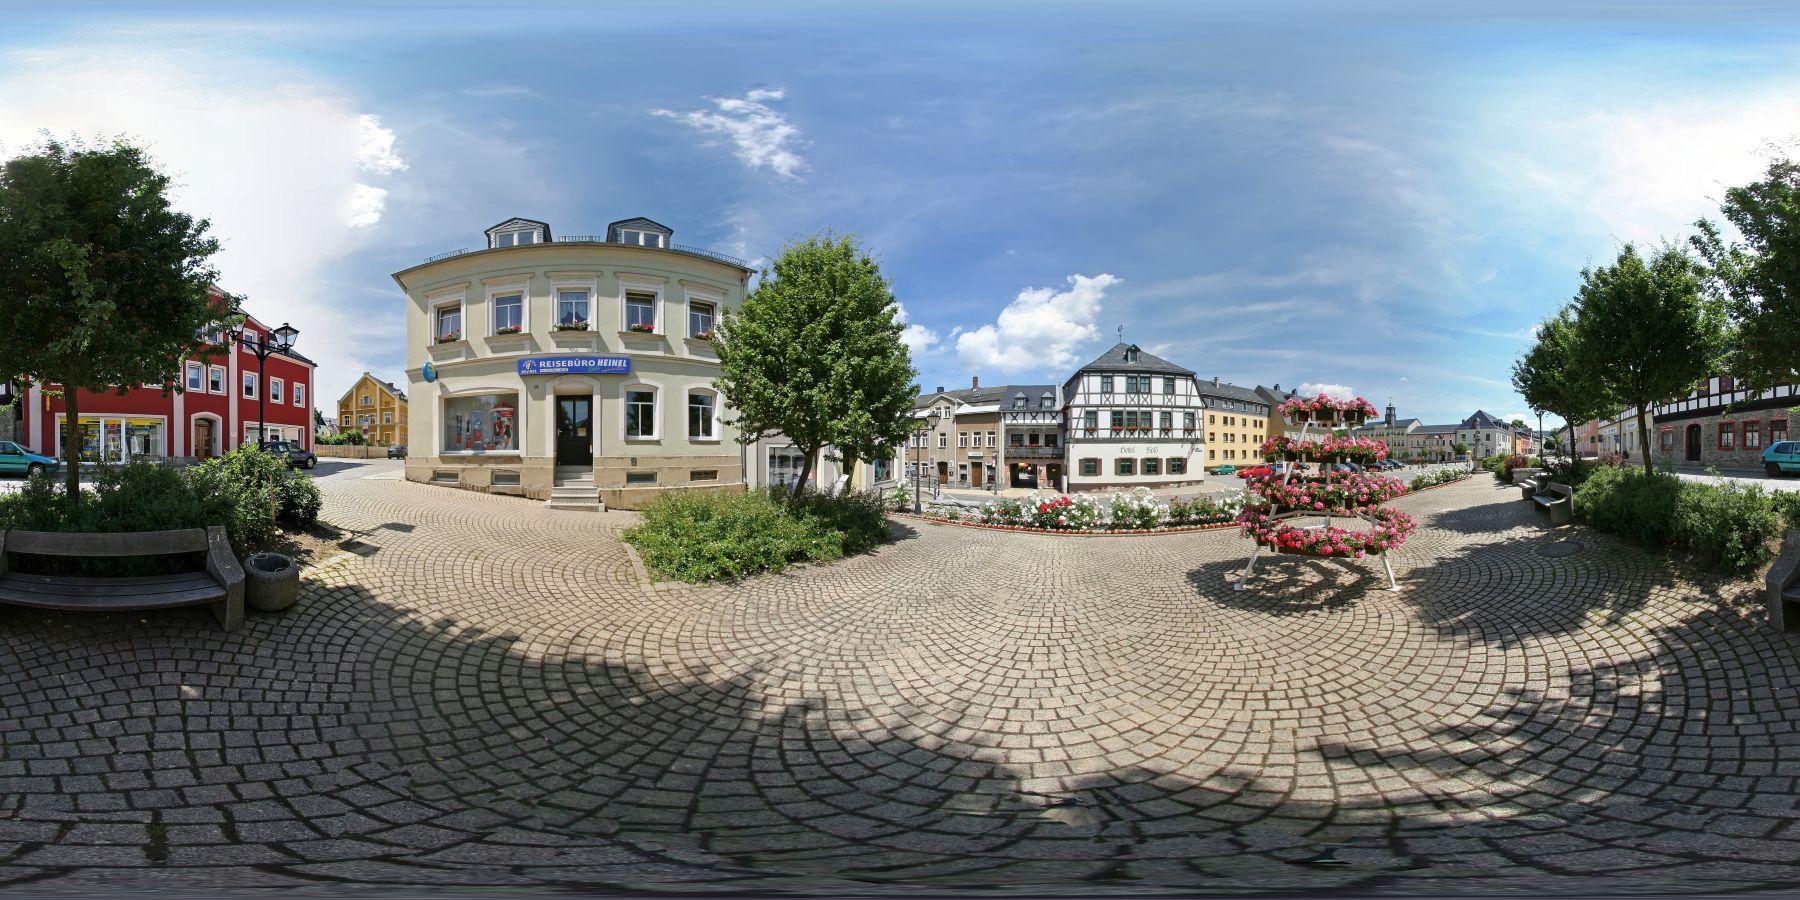 zwoenitz hotel markt